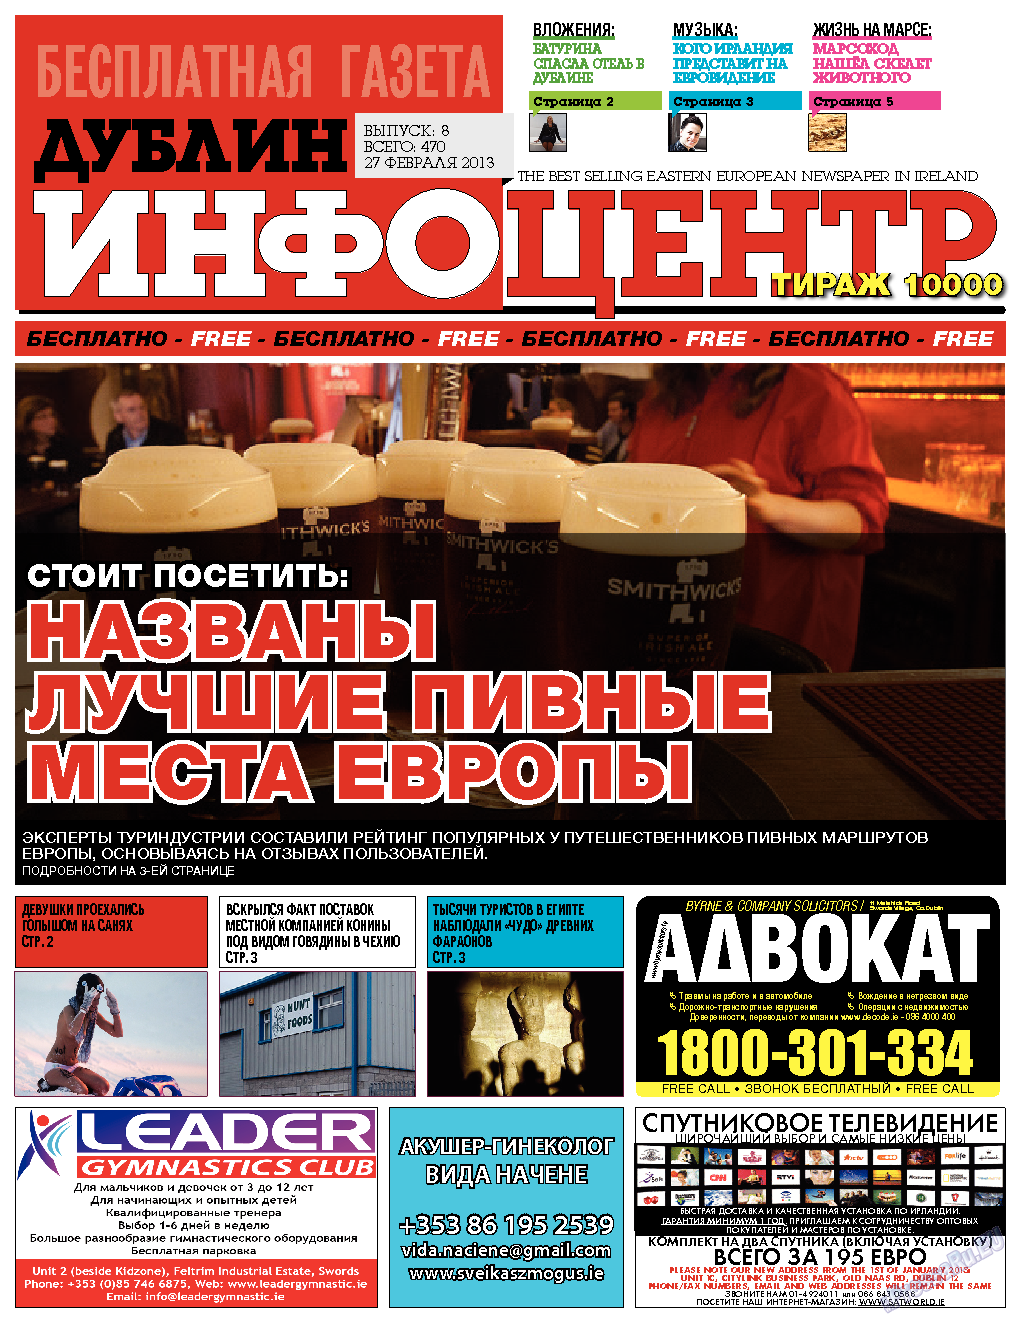 Дублин инфоцентр (газета). 2013 год, номер 8, стр. 1